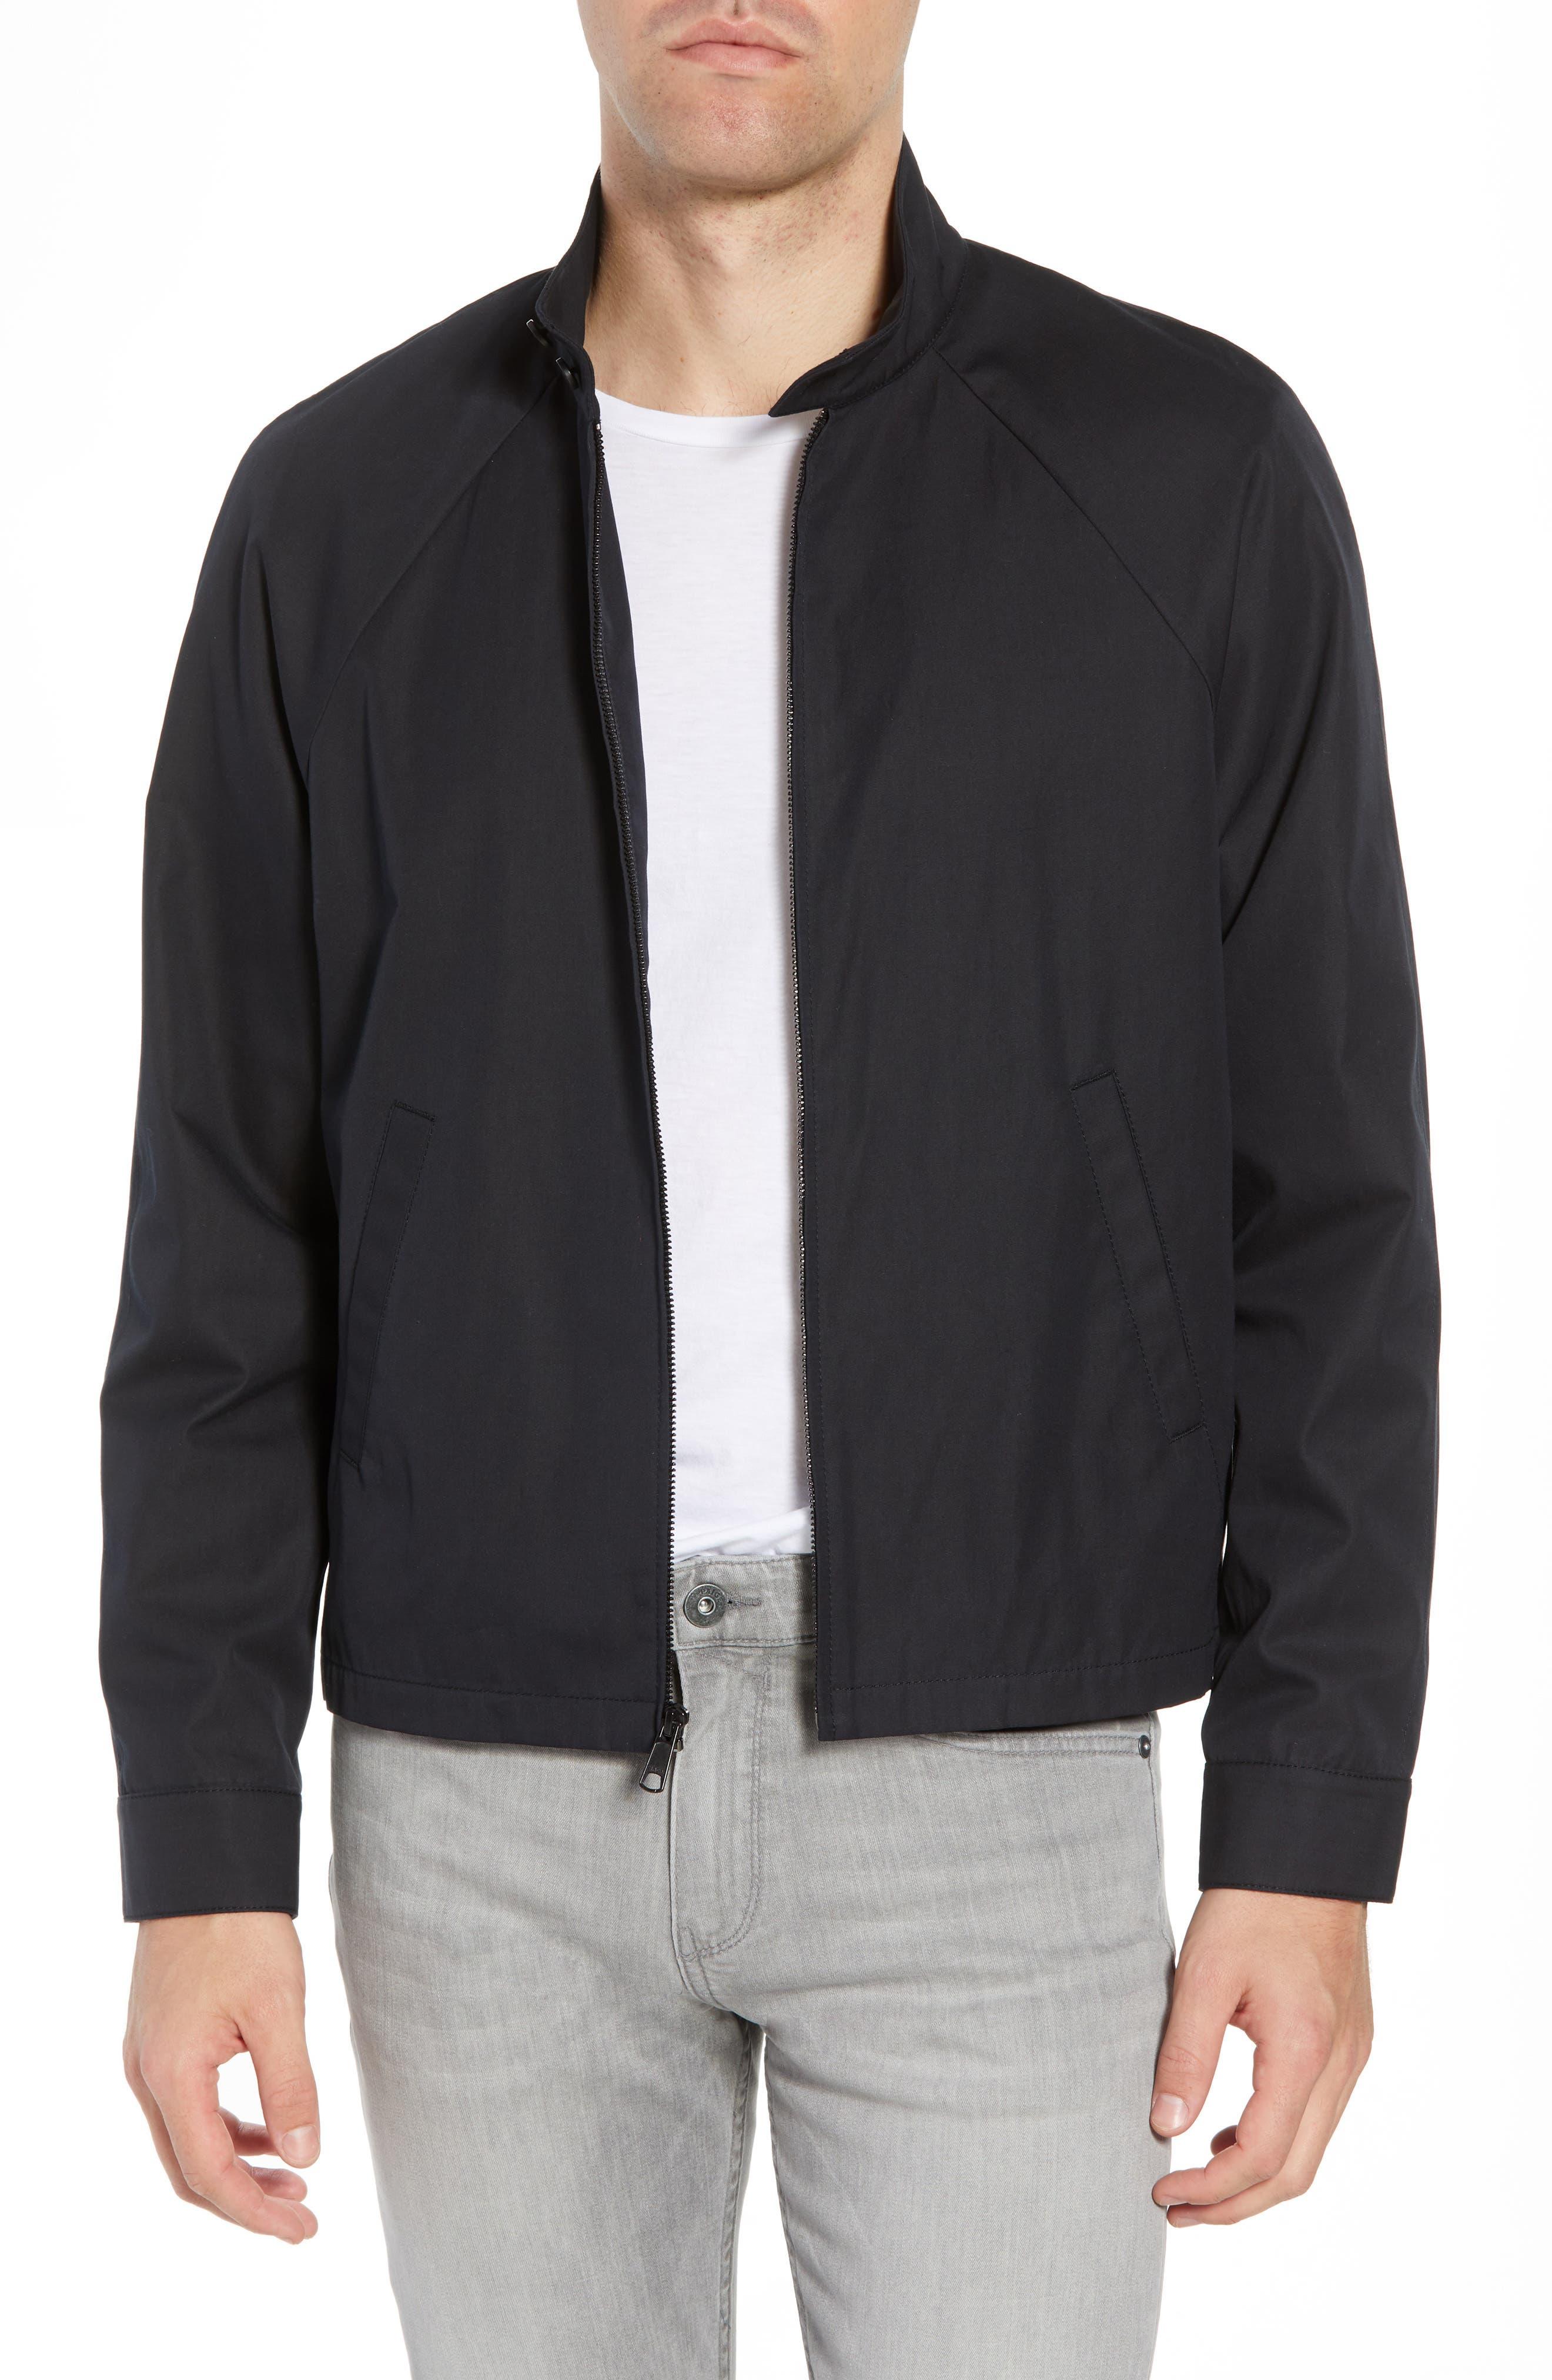 Regular Fit Jacket,                             Main thumbnail 1, color,                             Black